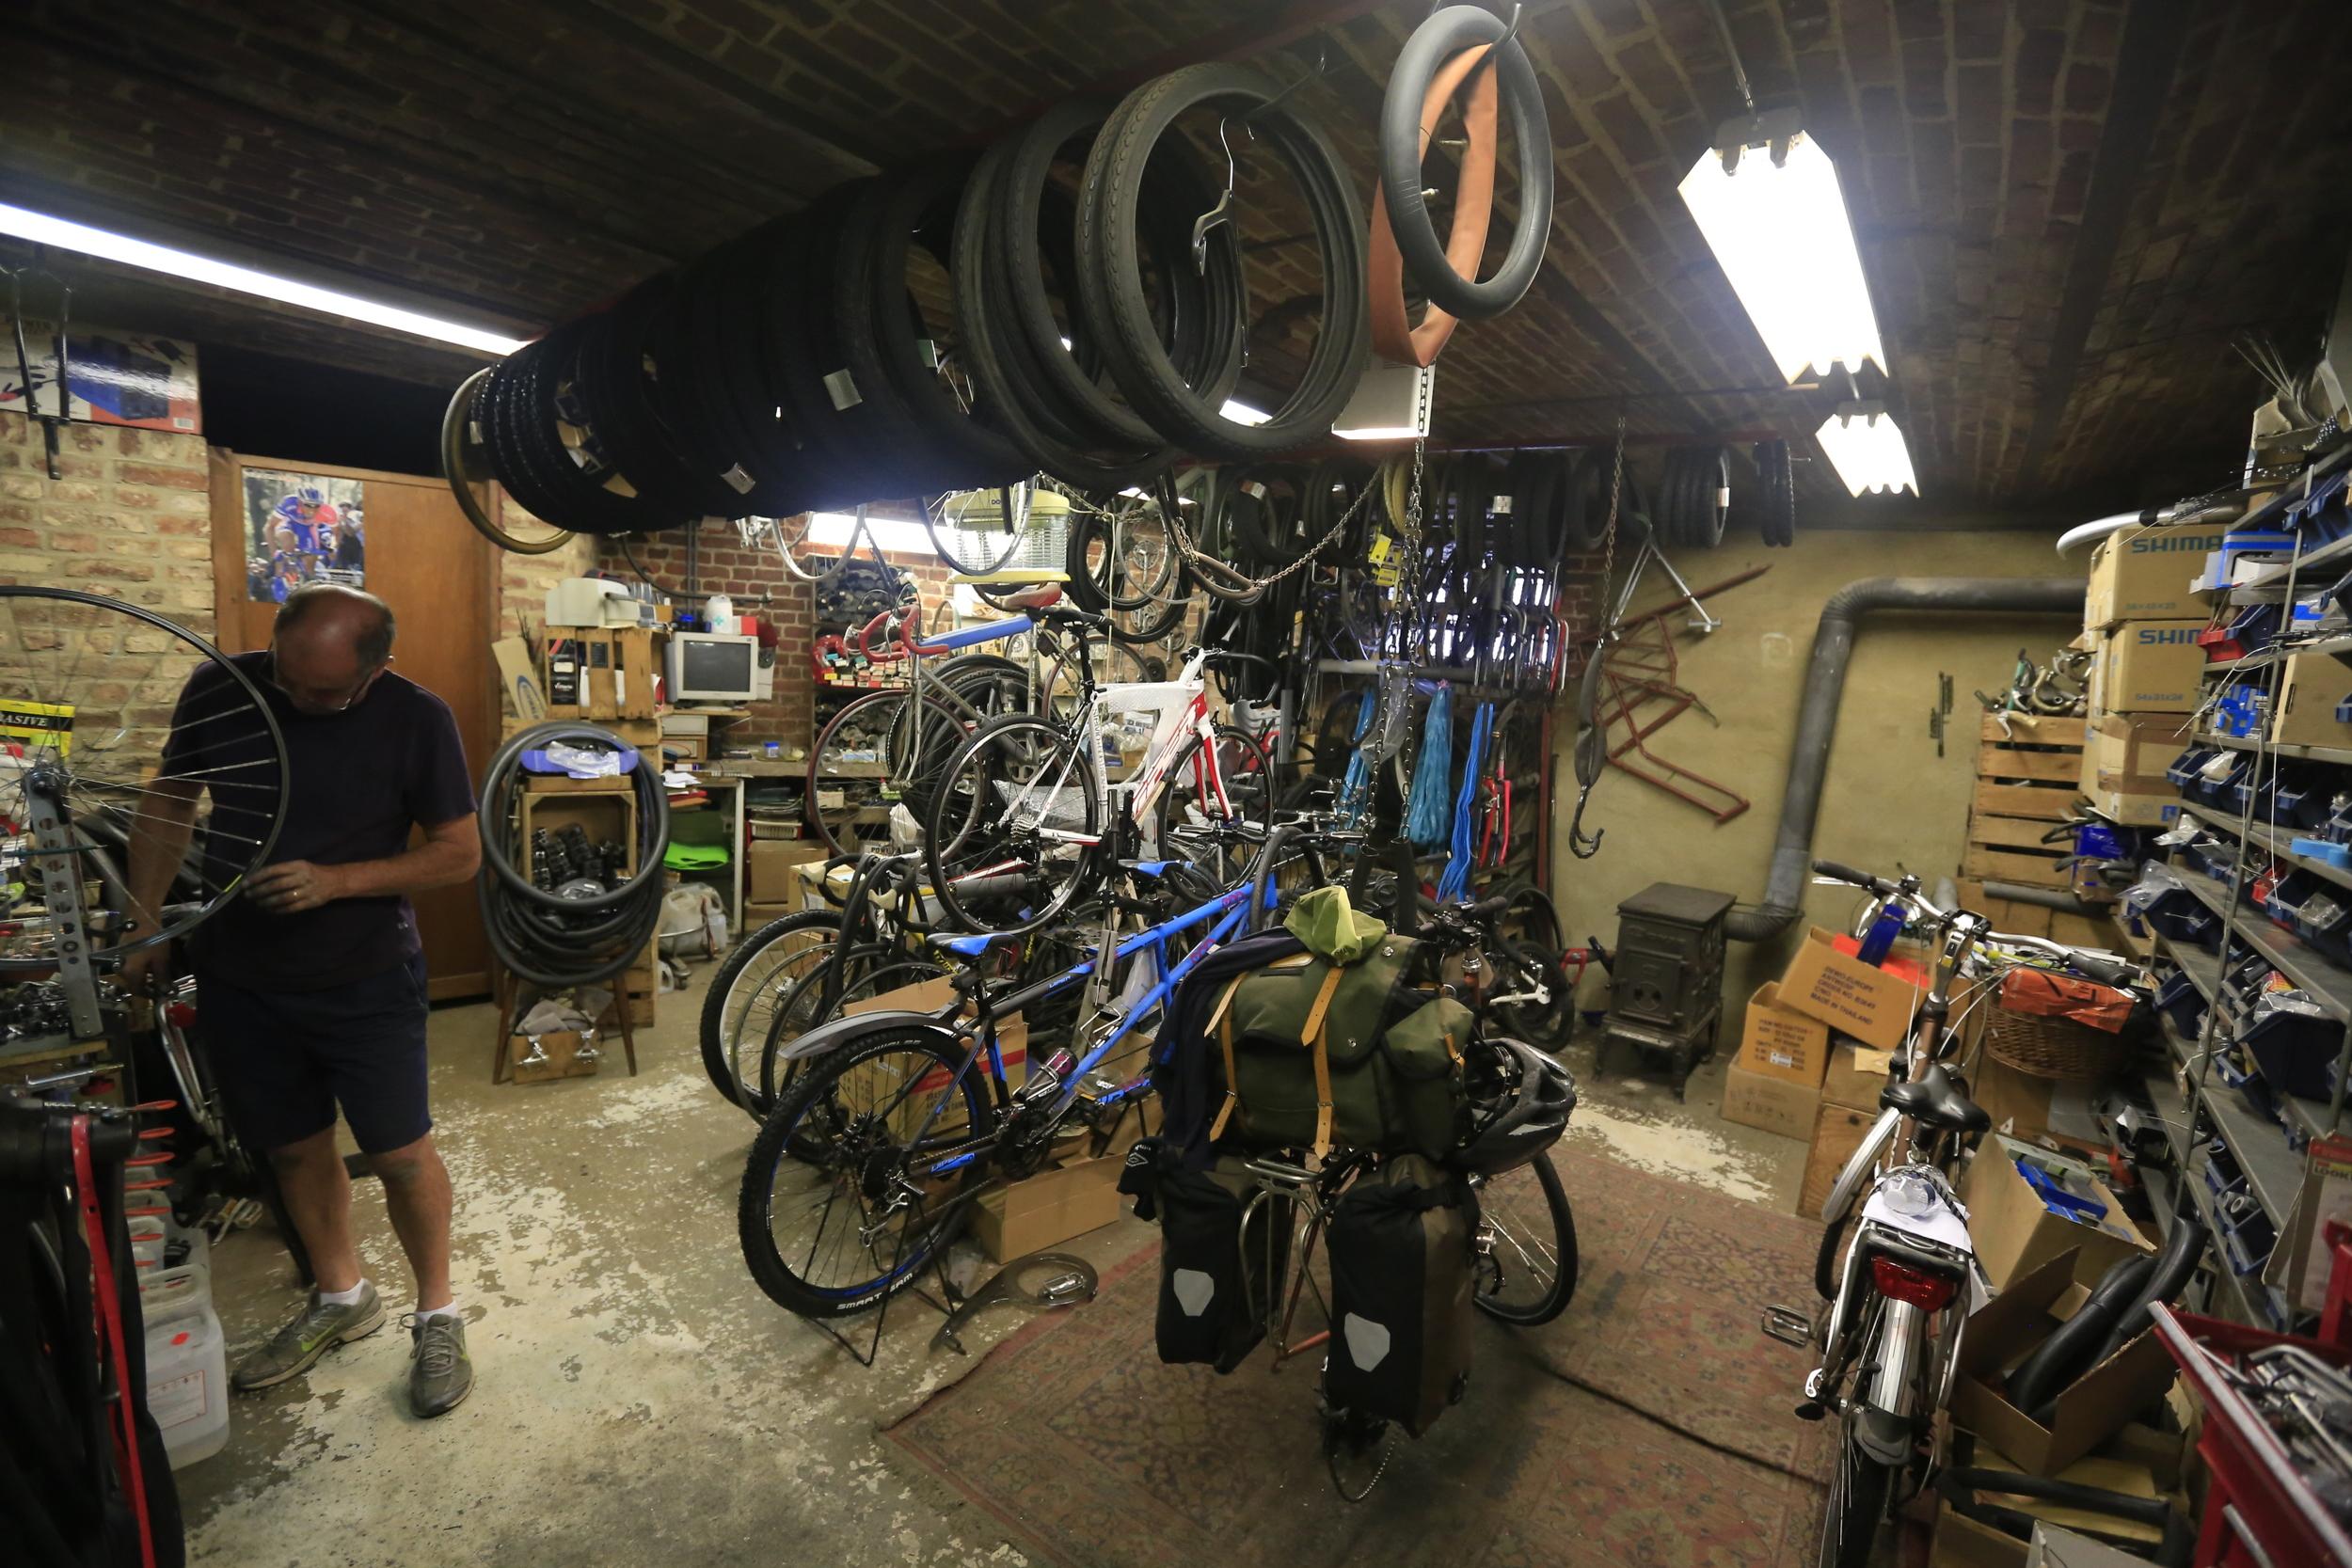 bikepacking, cycling shop, cycle store, cycling gear, touring, bike tours, bike routes, bike route, bike touring, surly, pannier, ortlieb, steel frame, lejog, Carradice, Brooks, fat bike, Garmin, bicycle touring apocalypse, Schwalbe, Mavic, Tubus,